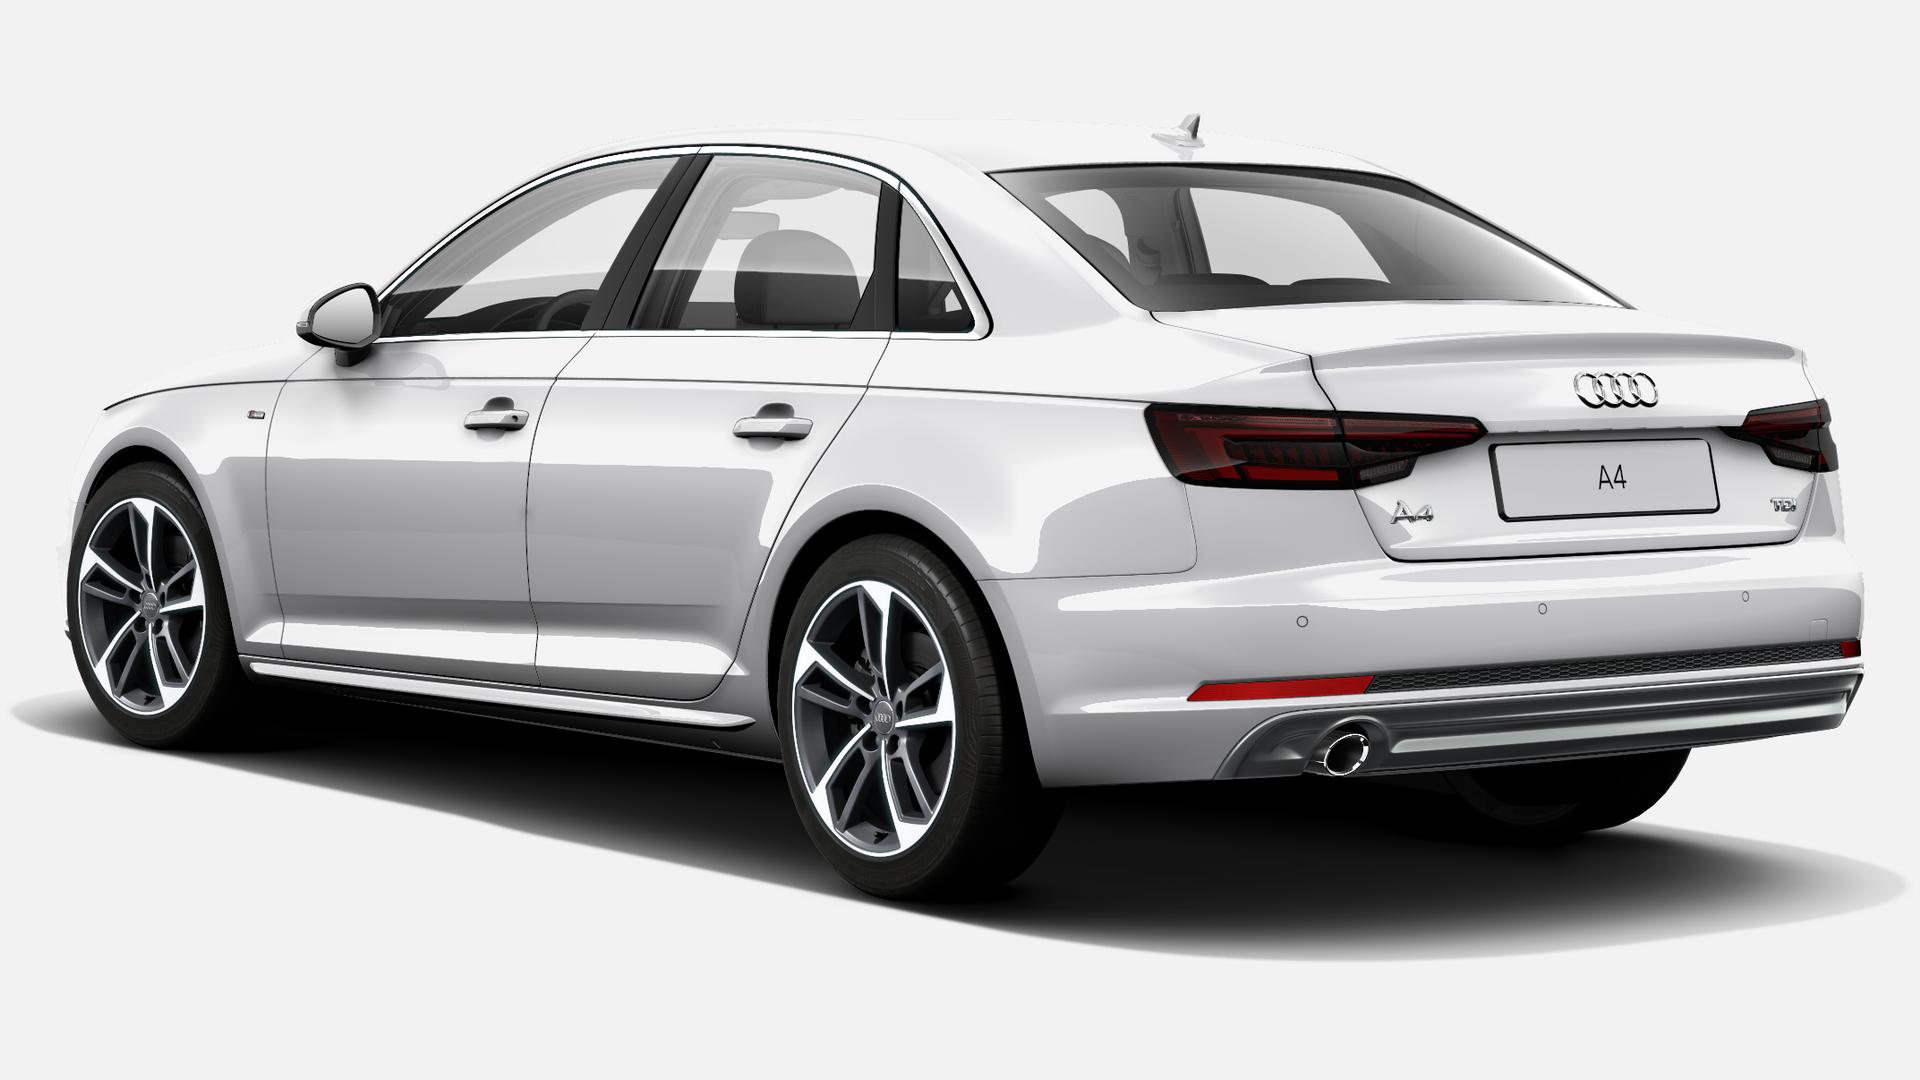 Audi A4 2.0 TDI S Line Edition S Tronic 110 kW (150 CV)